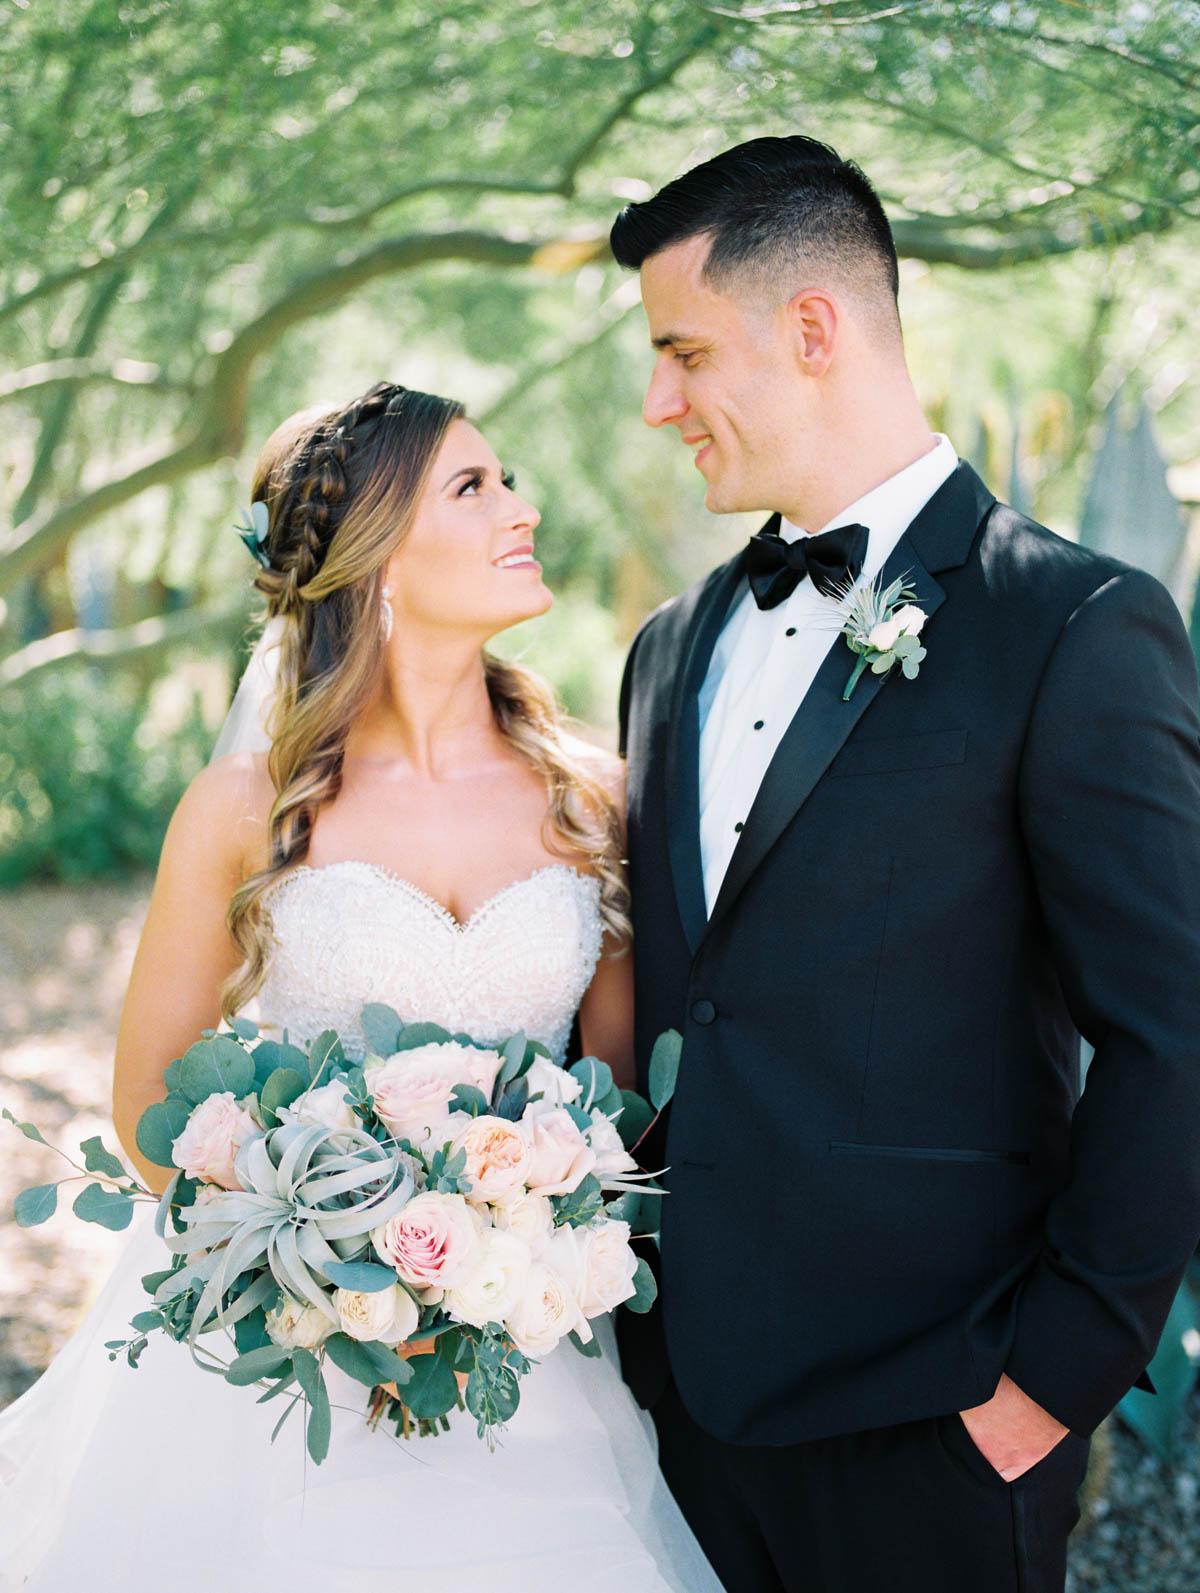 Joyful bride and groom captured by Tucson Wedding Photographers Betsy & John